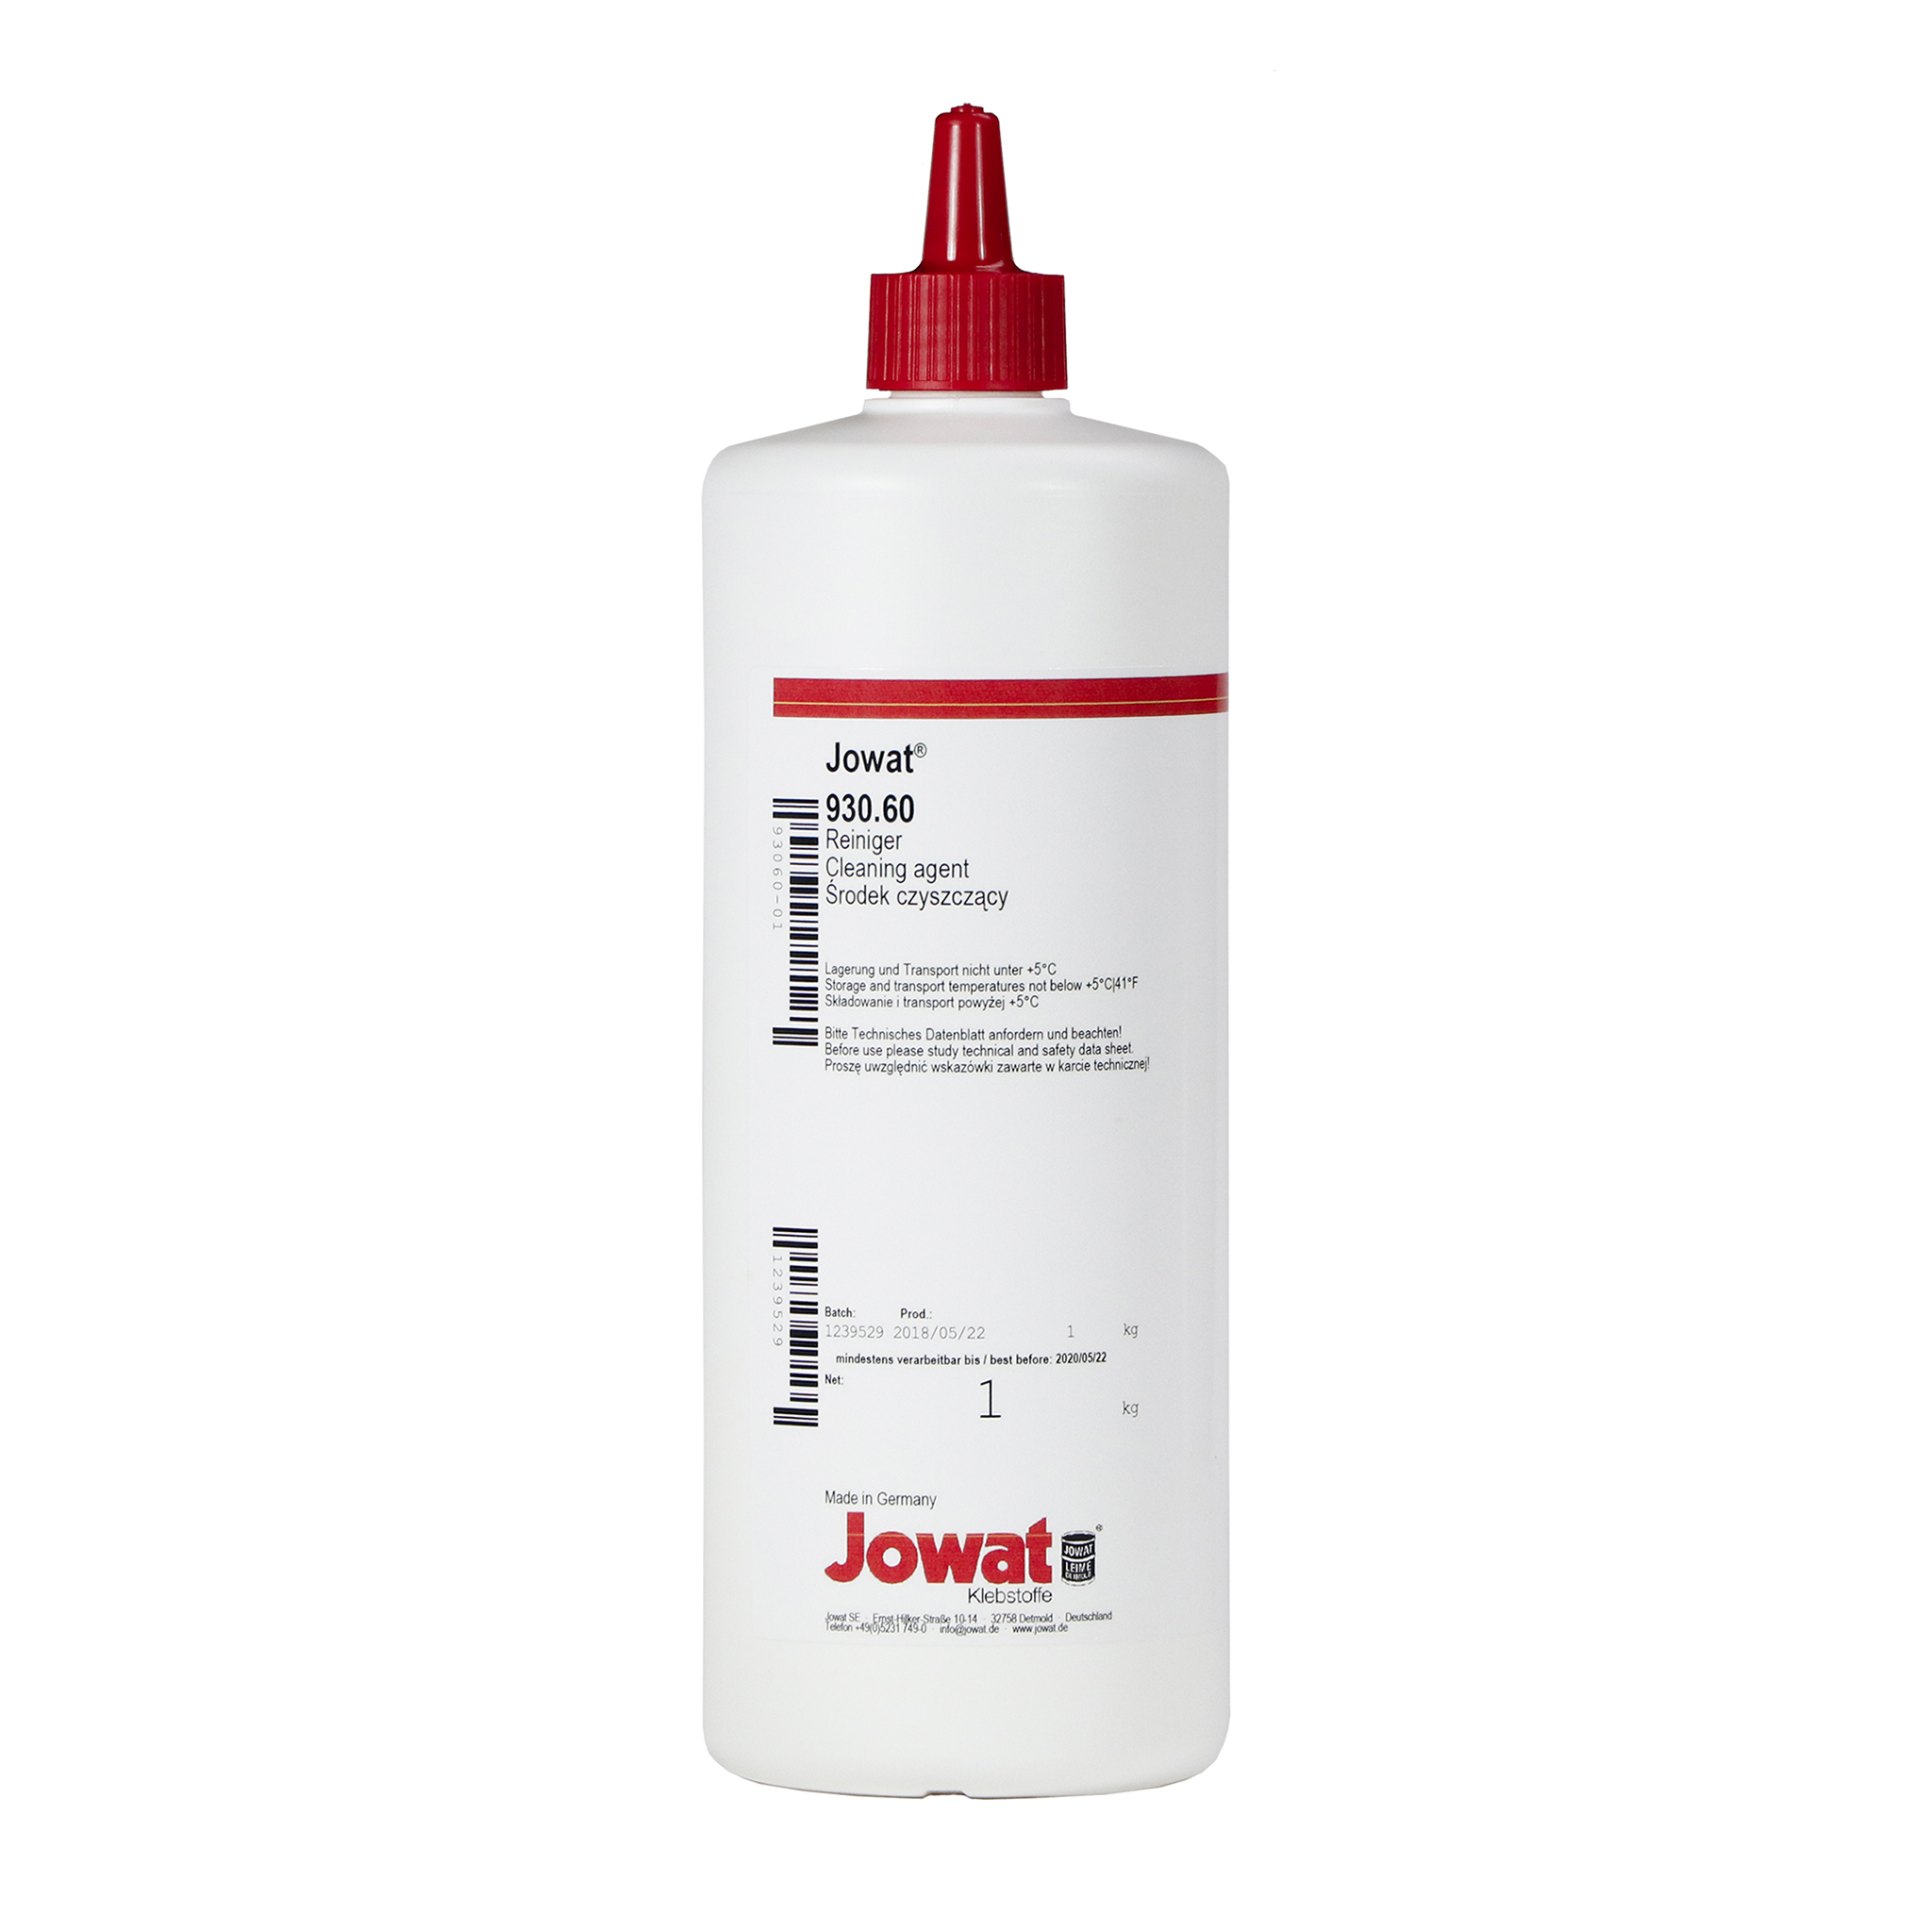 JOWAT 930.60 Cleaner